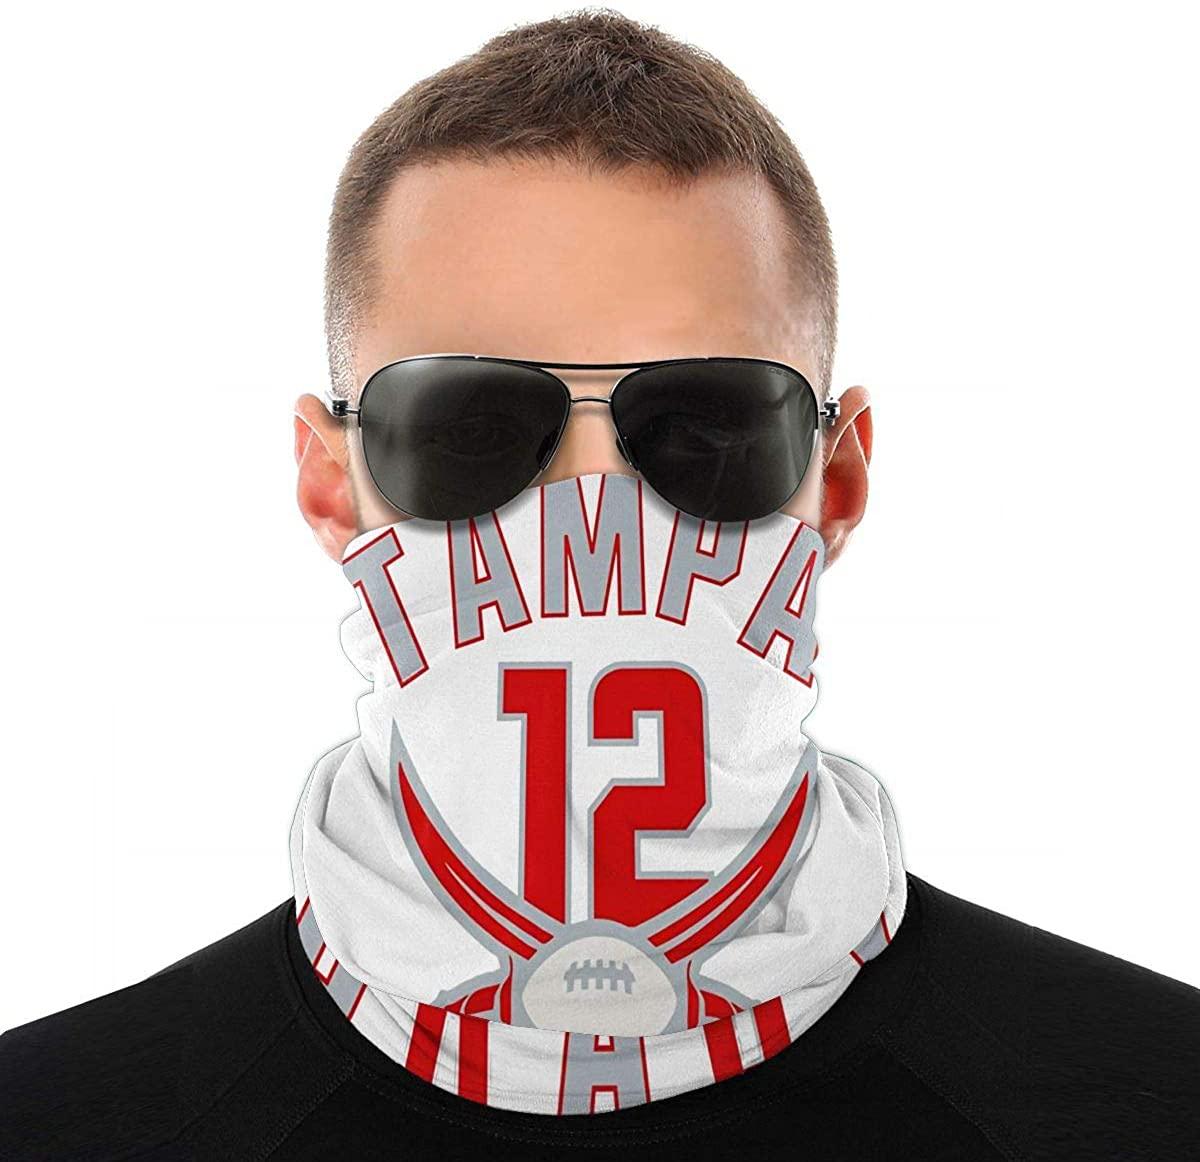 Tampa Bay Brady Face Mask Neck Leggings Windshield Dustproof Outdoor Balaclava Scarf Turban